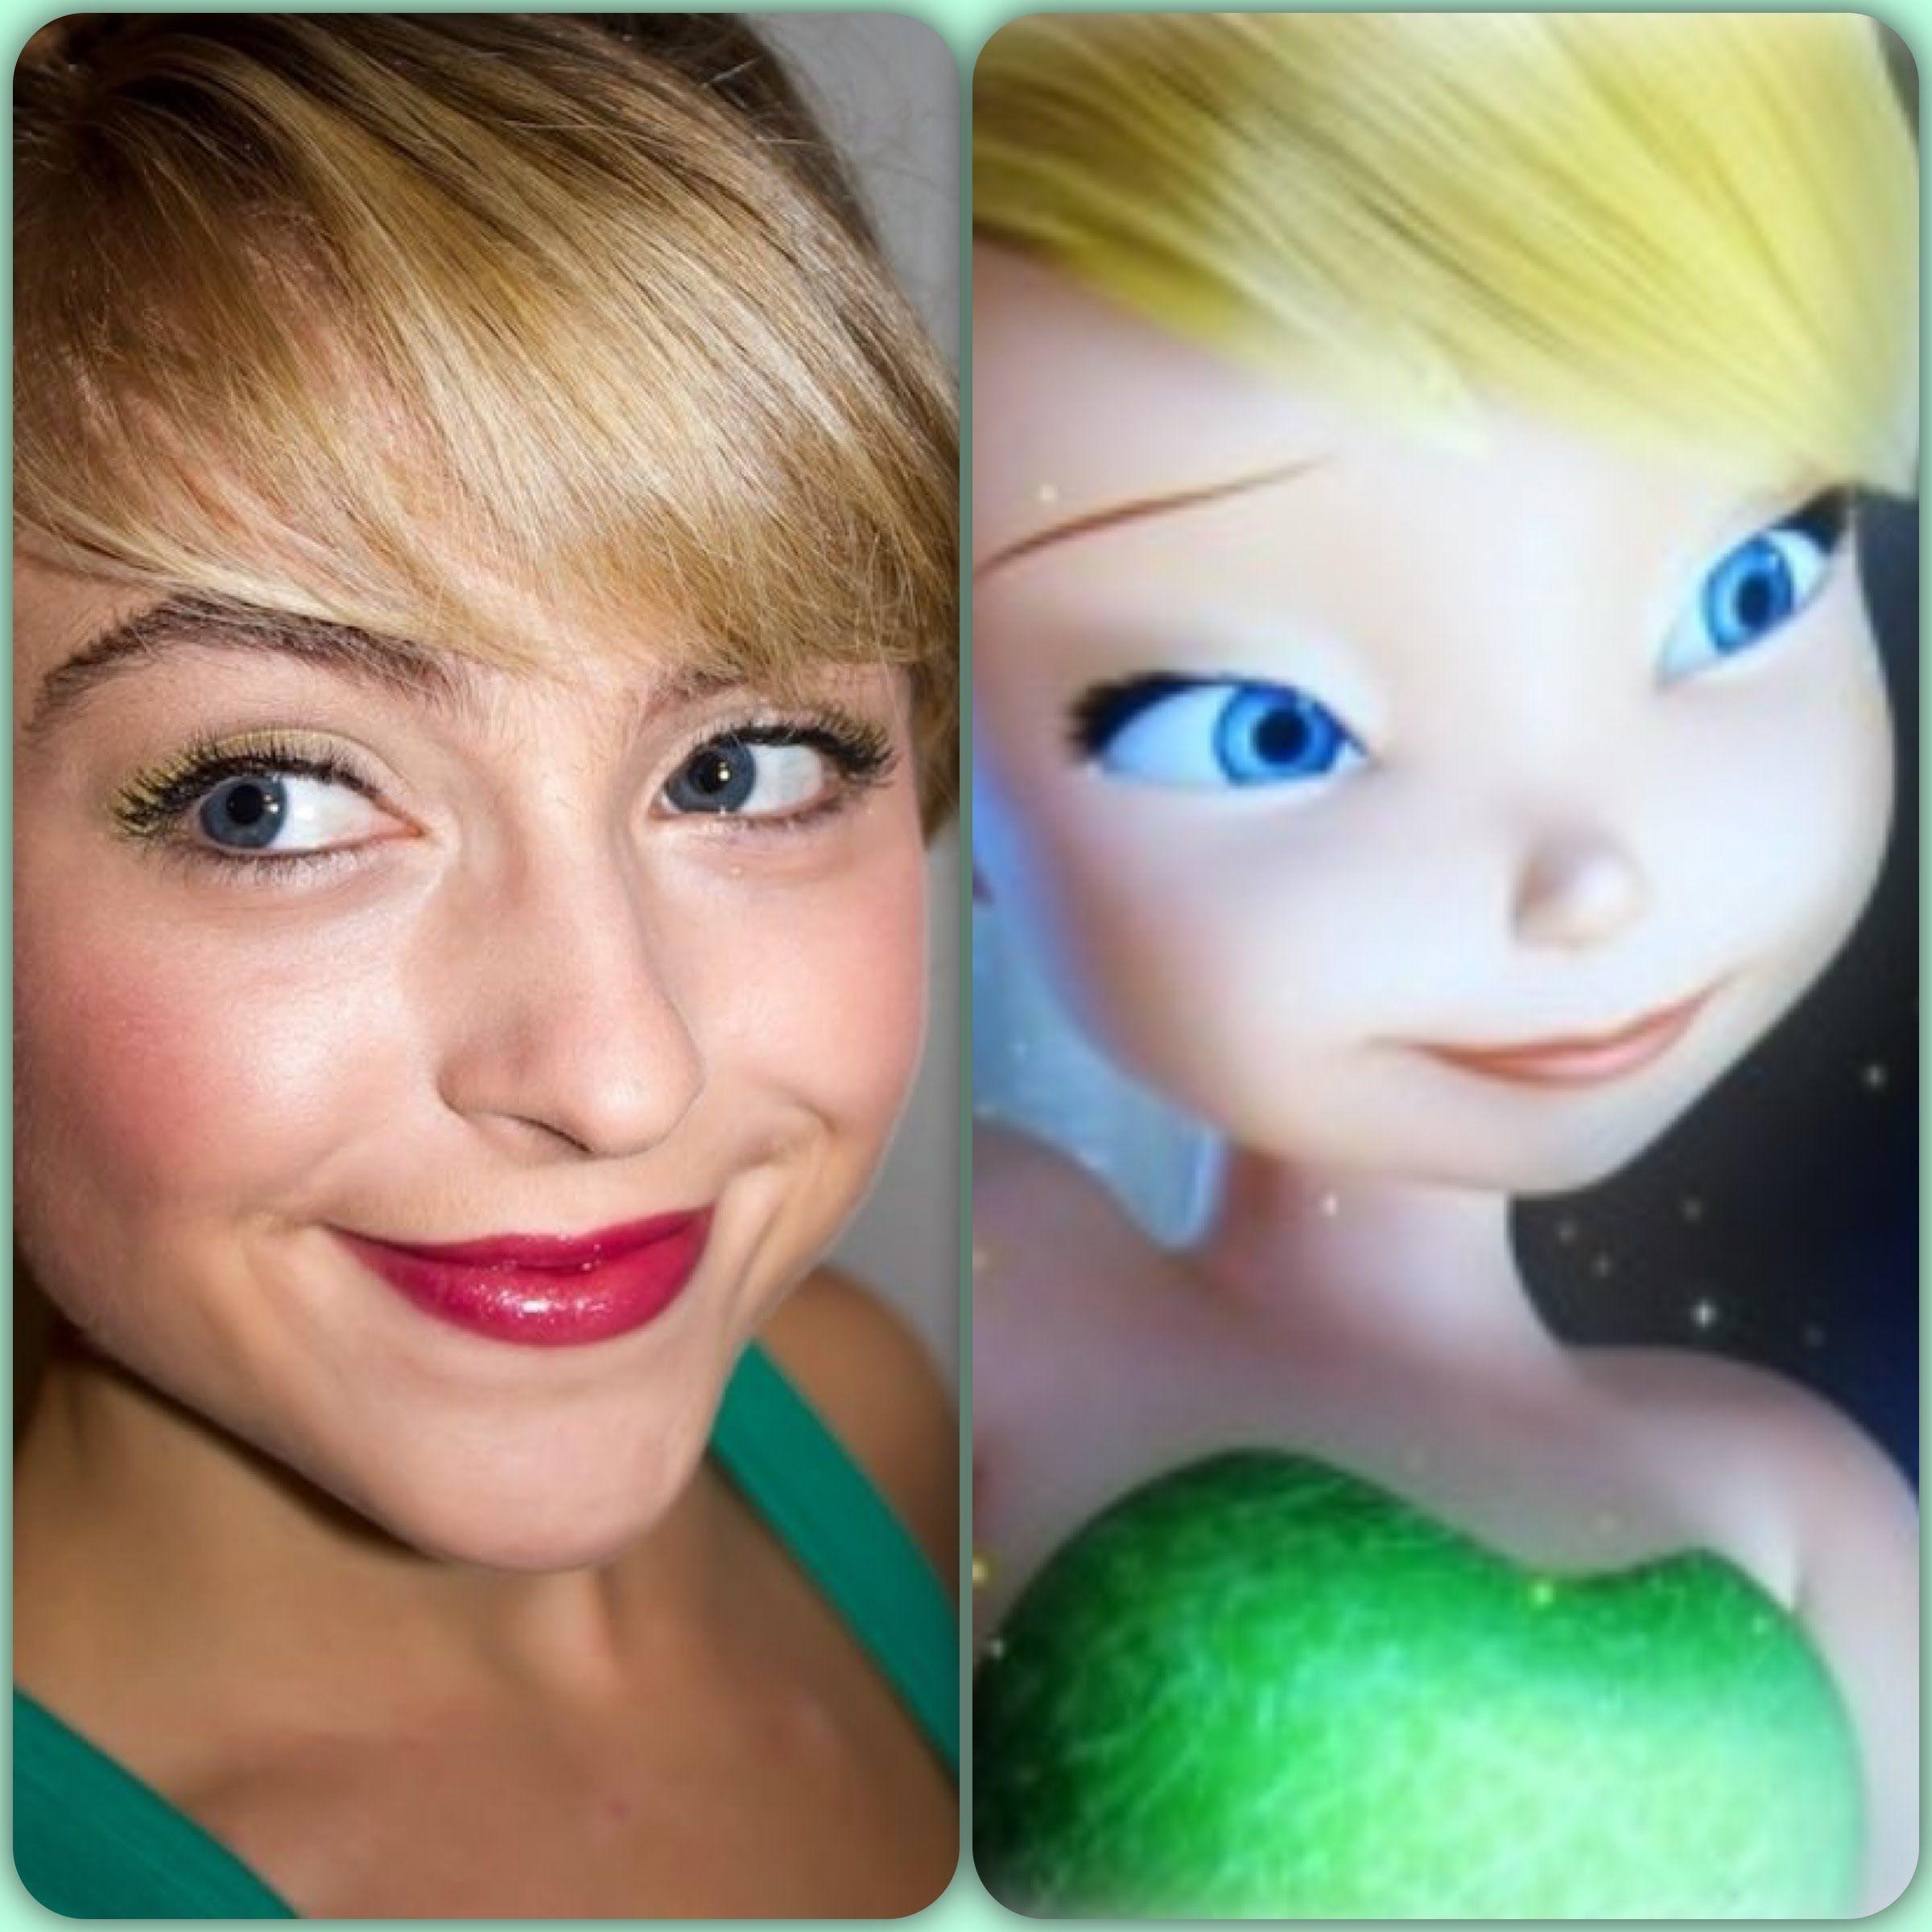 Tinker Bell Hair And Makeup Tutorial Tinker Bell Hair Makeup Tutorial Hair Makeup